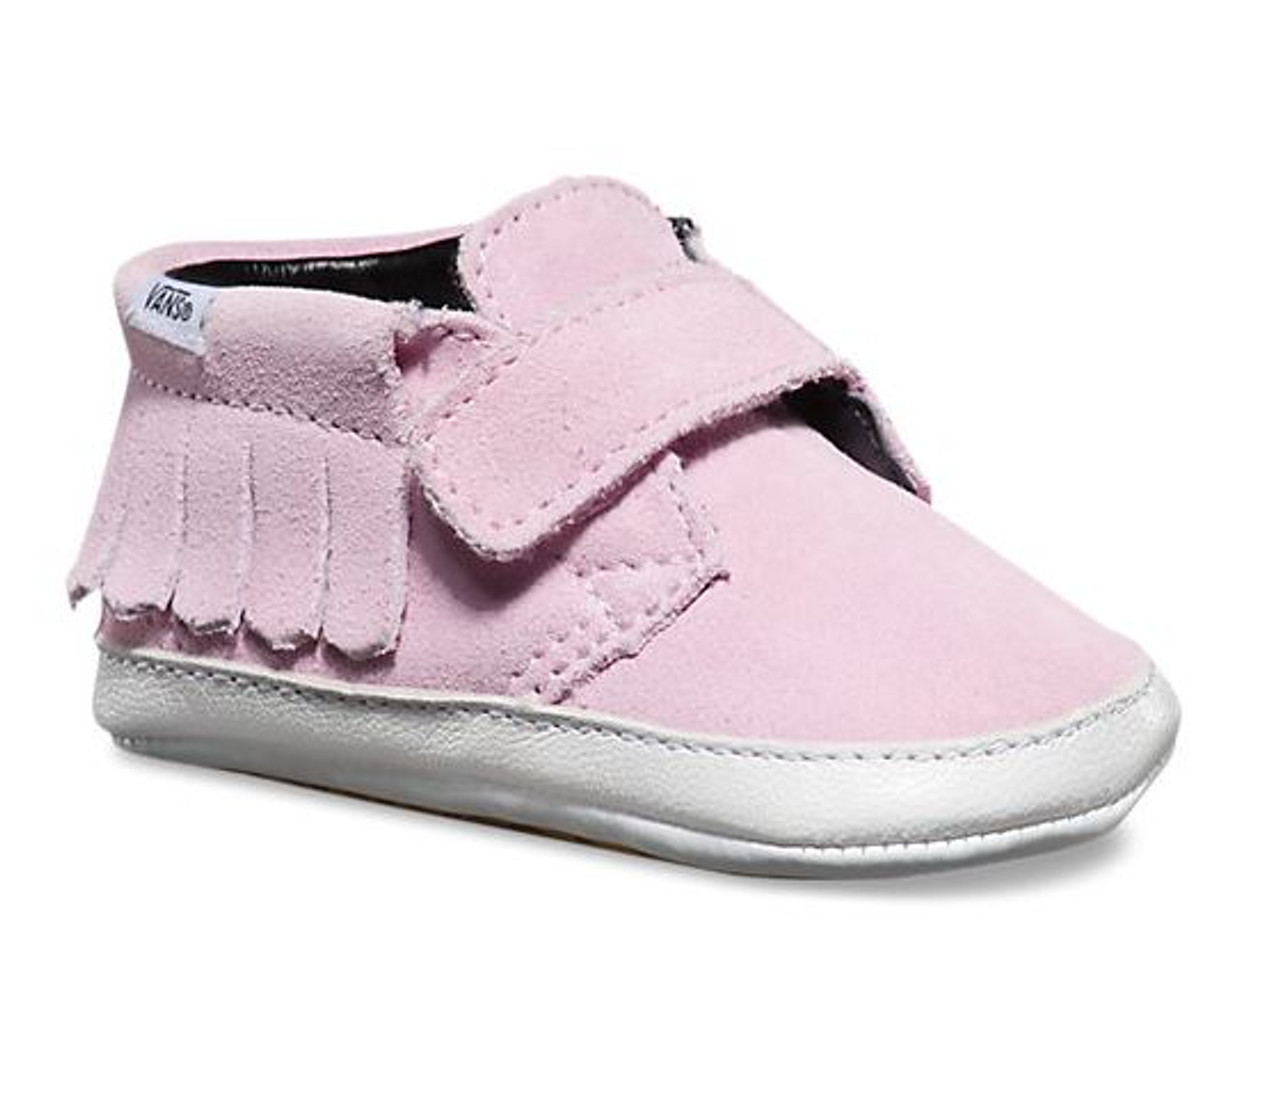 42910e251d3d08 Vans Baby Infant Suede Chukka V Moc Mist Pink Shoes